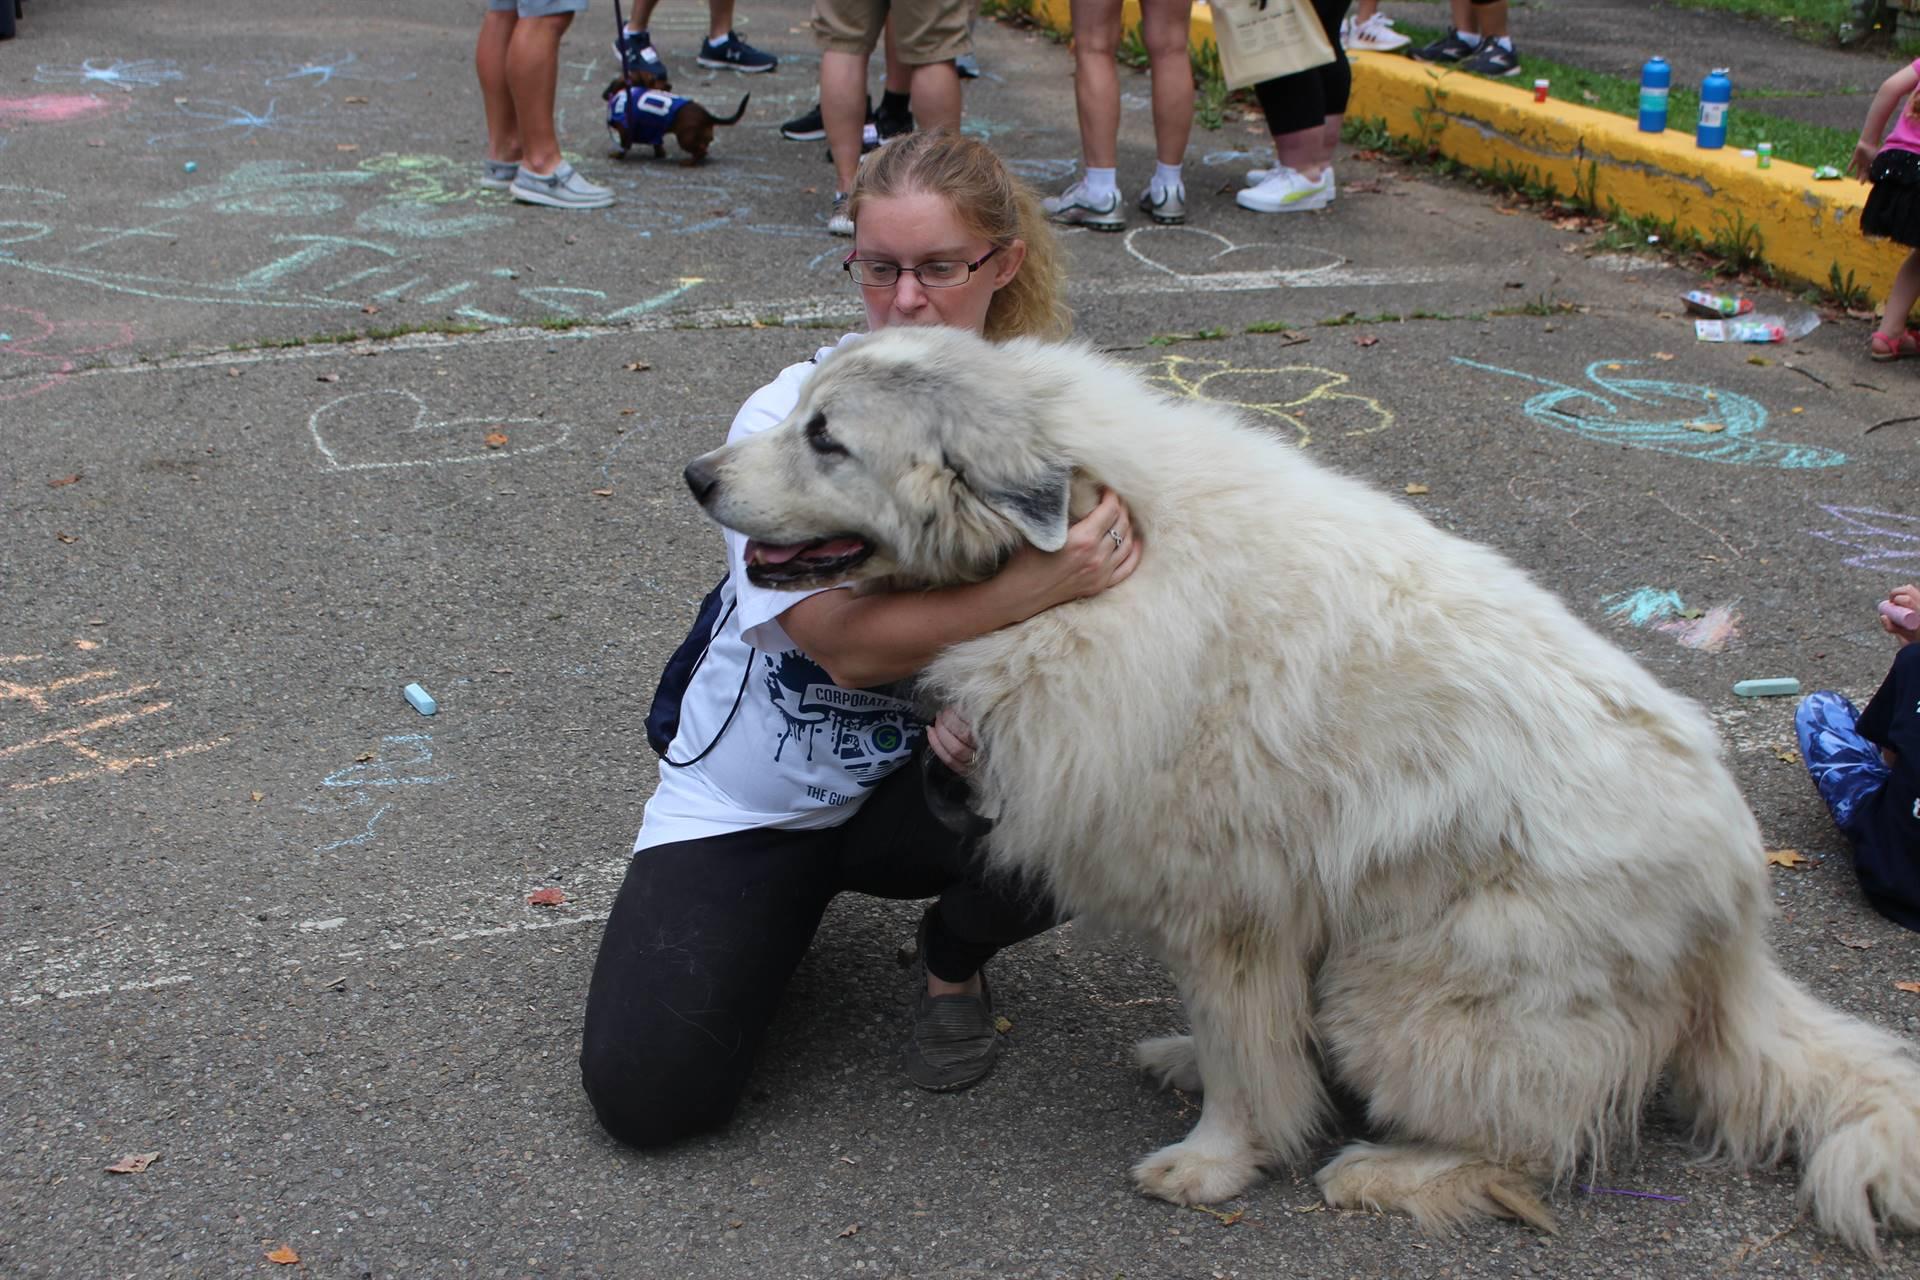 women with large dog